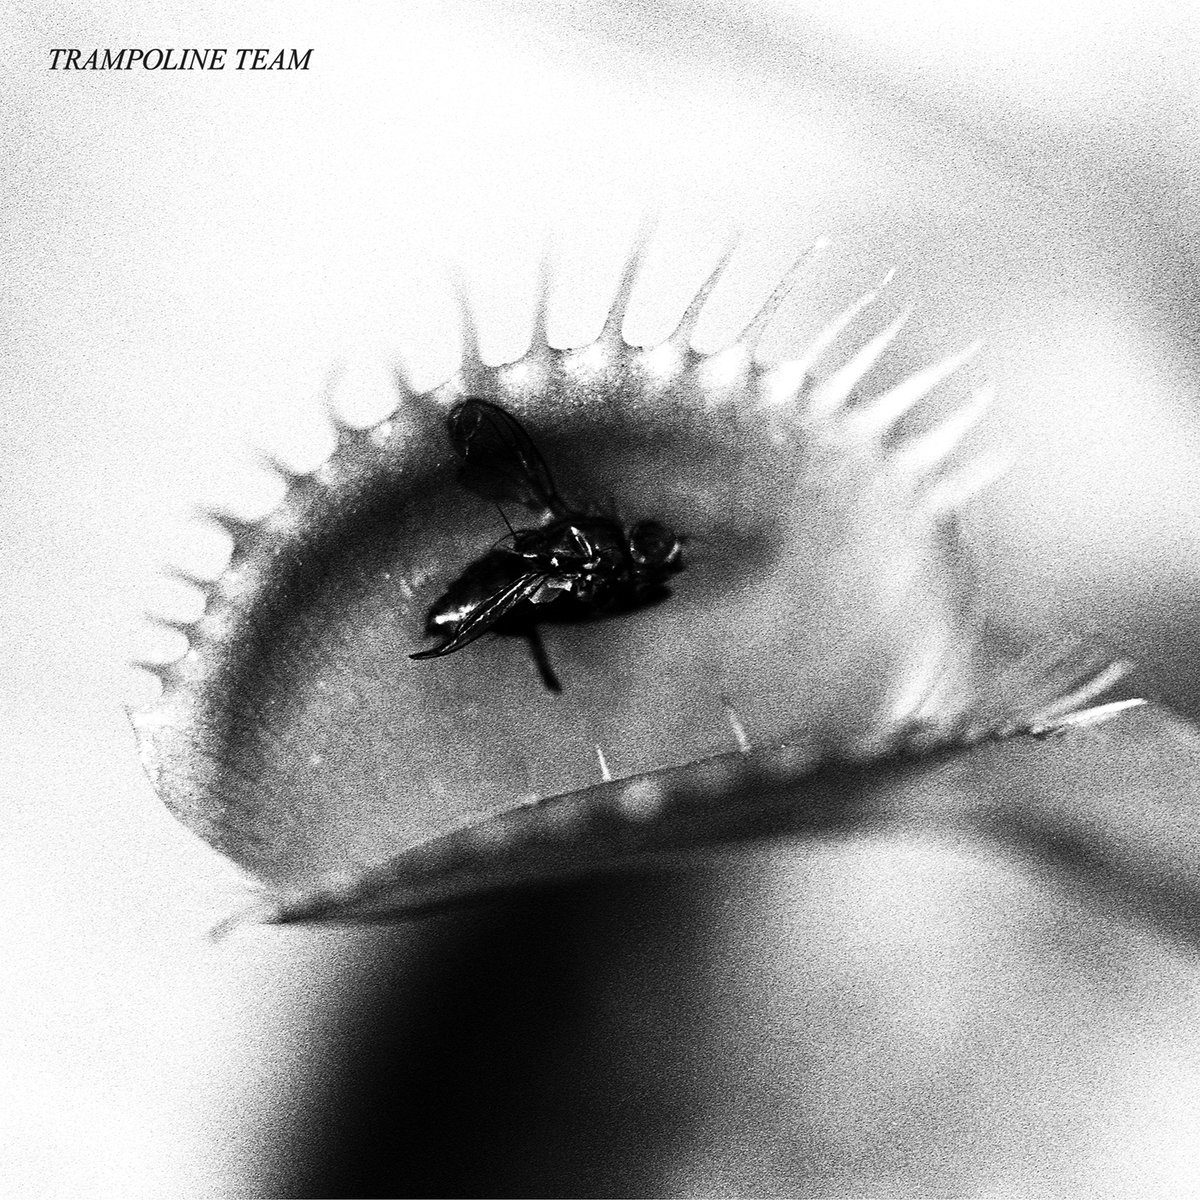 Trampoline Team | Trampoline Team | 3hive.com